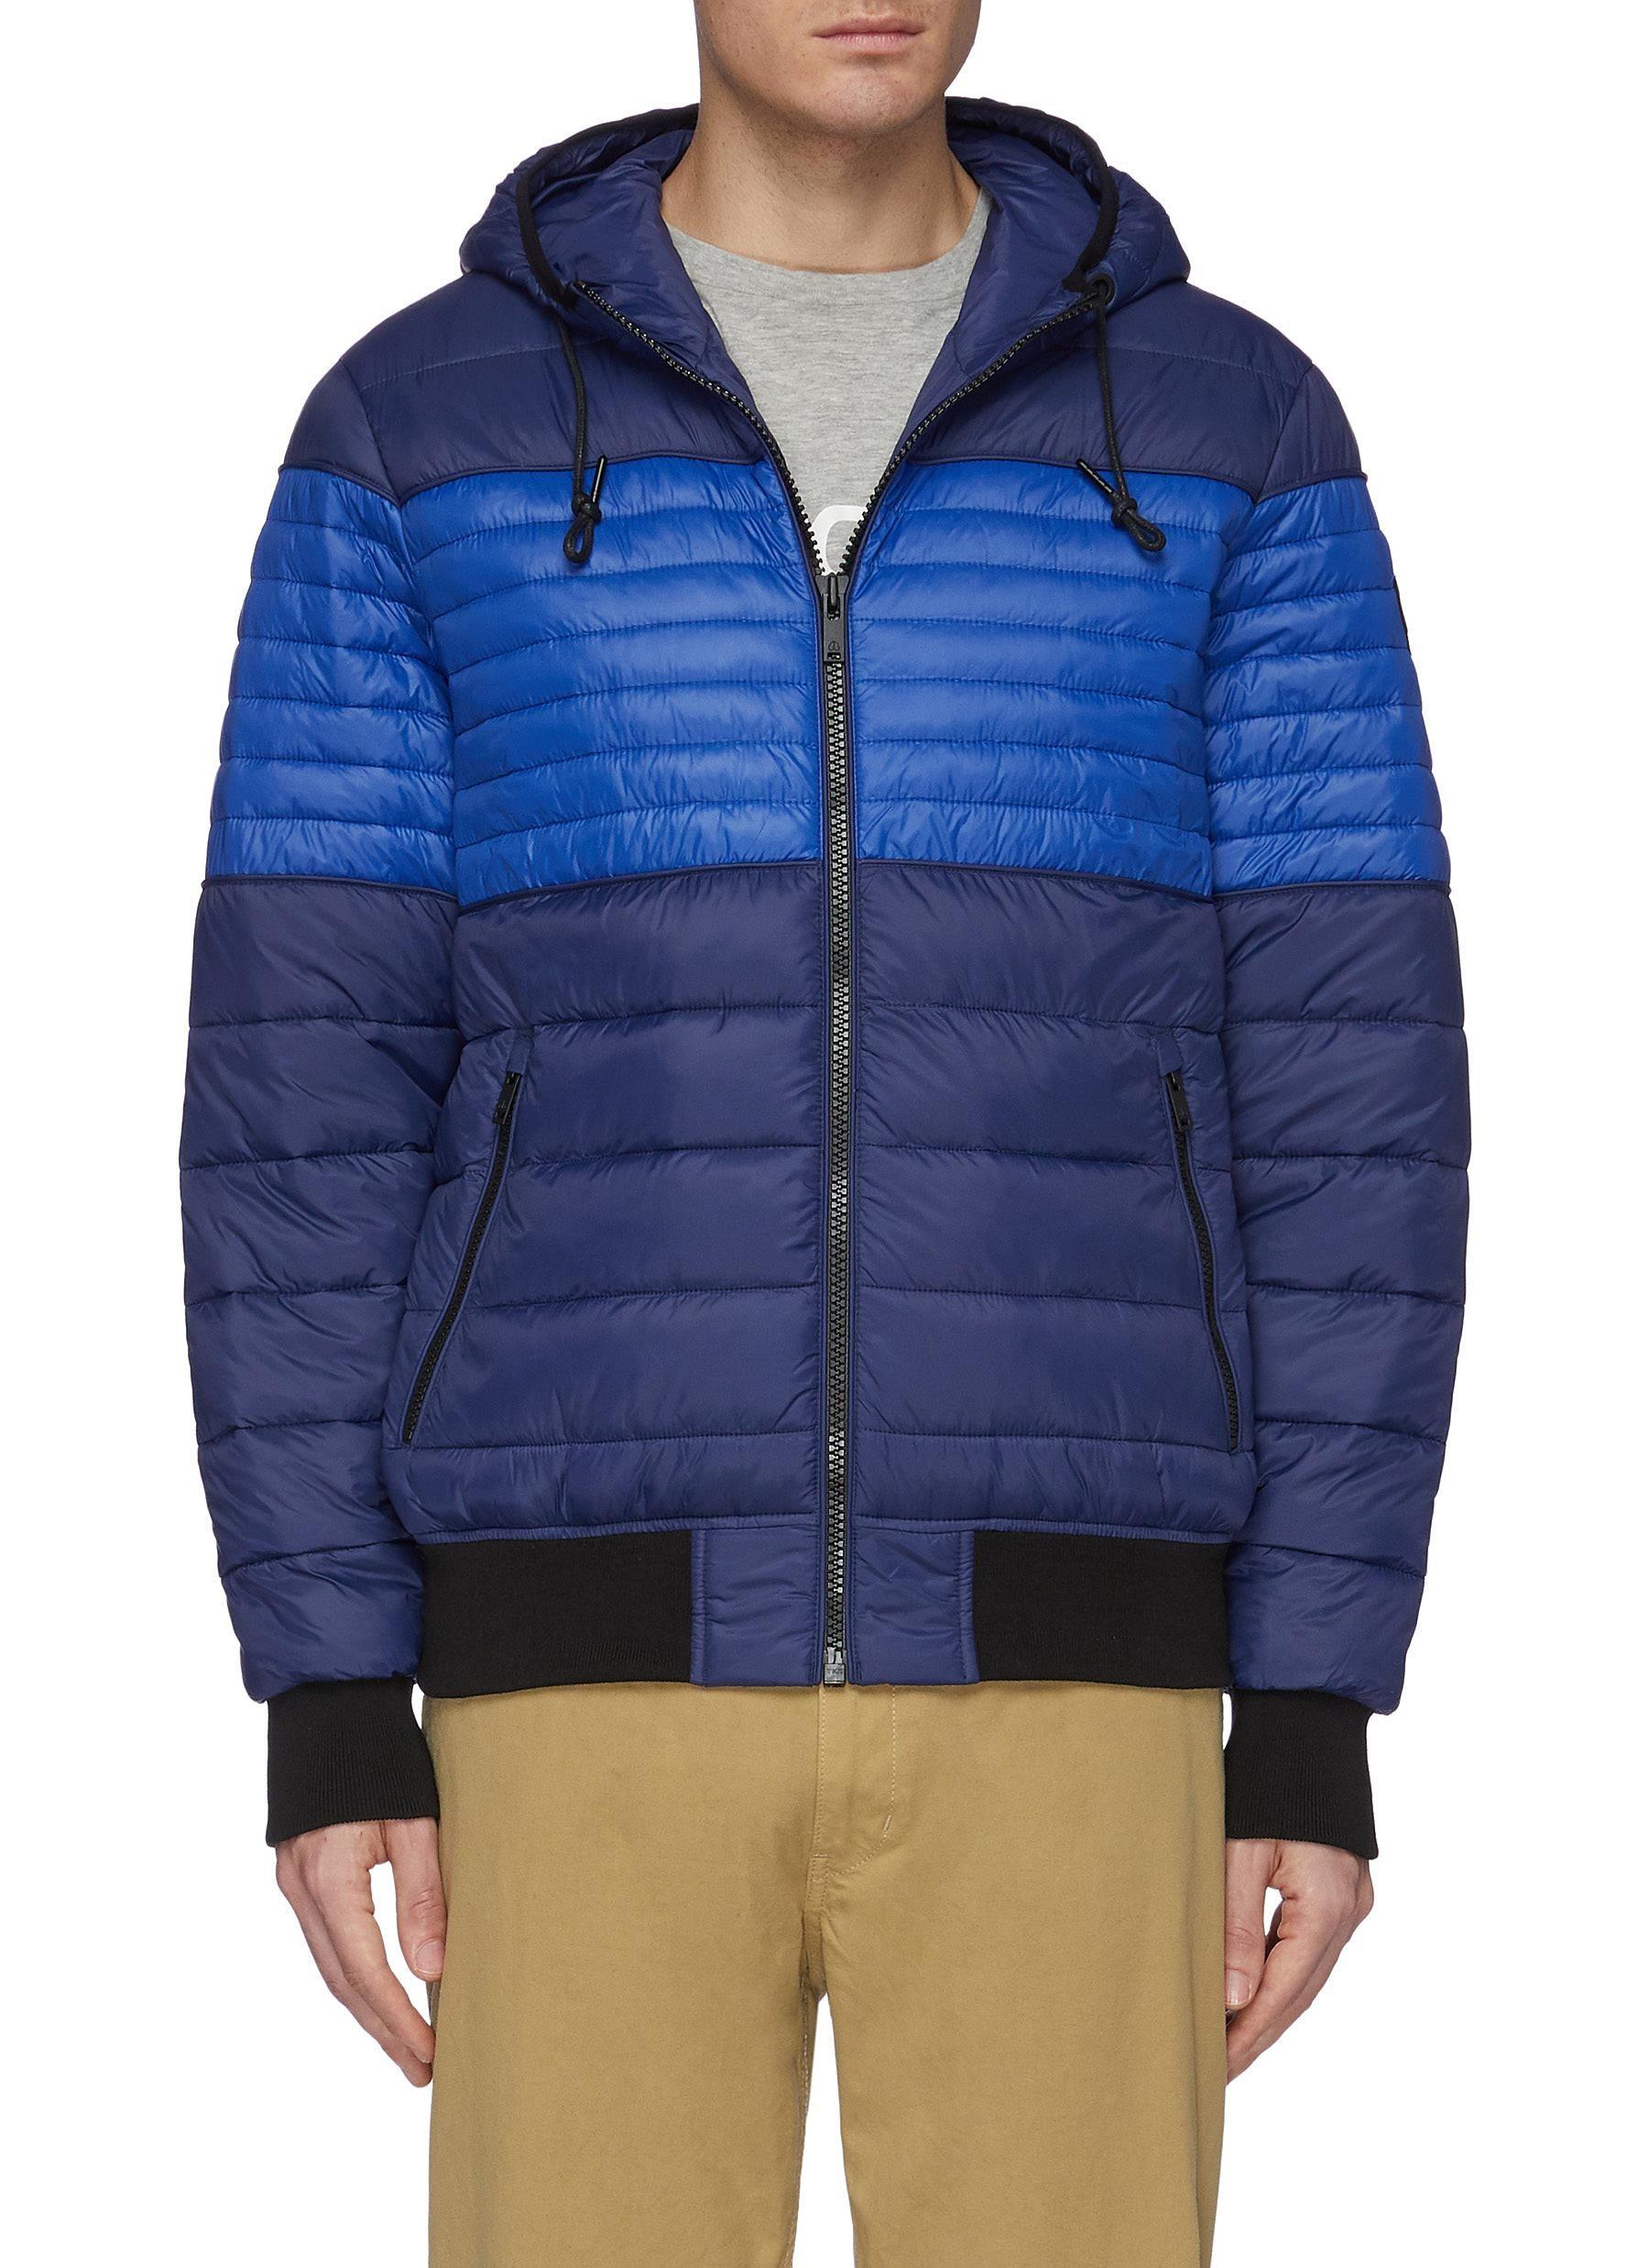 Moose Knuckles Terra Nova Hooded Puffer Jacket In Navy Cobalt Blue Modesens Puffer Jacket Style Puffer Jacket Men Puffer Jackets [ 2475 x 1800 Pixel ]